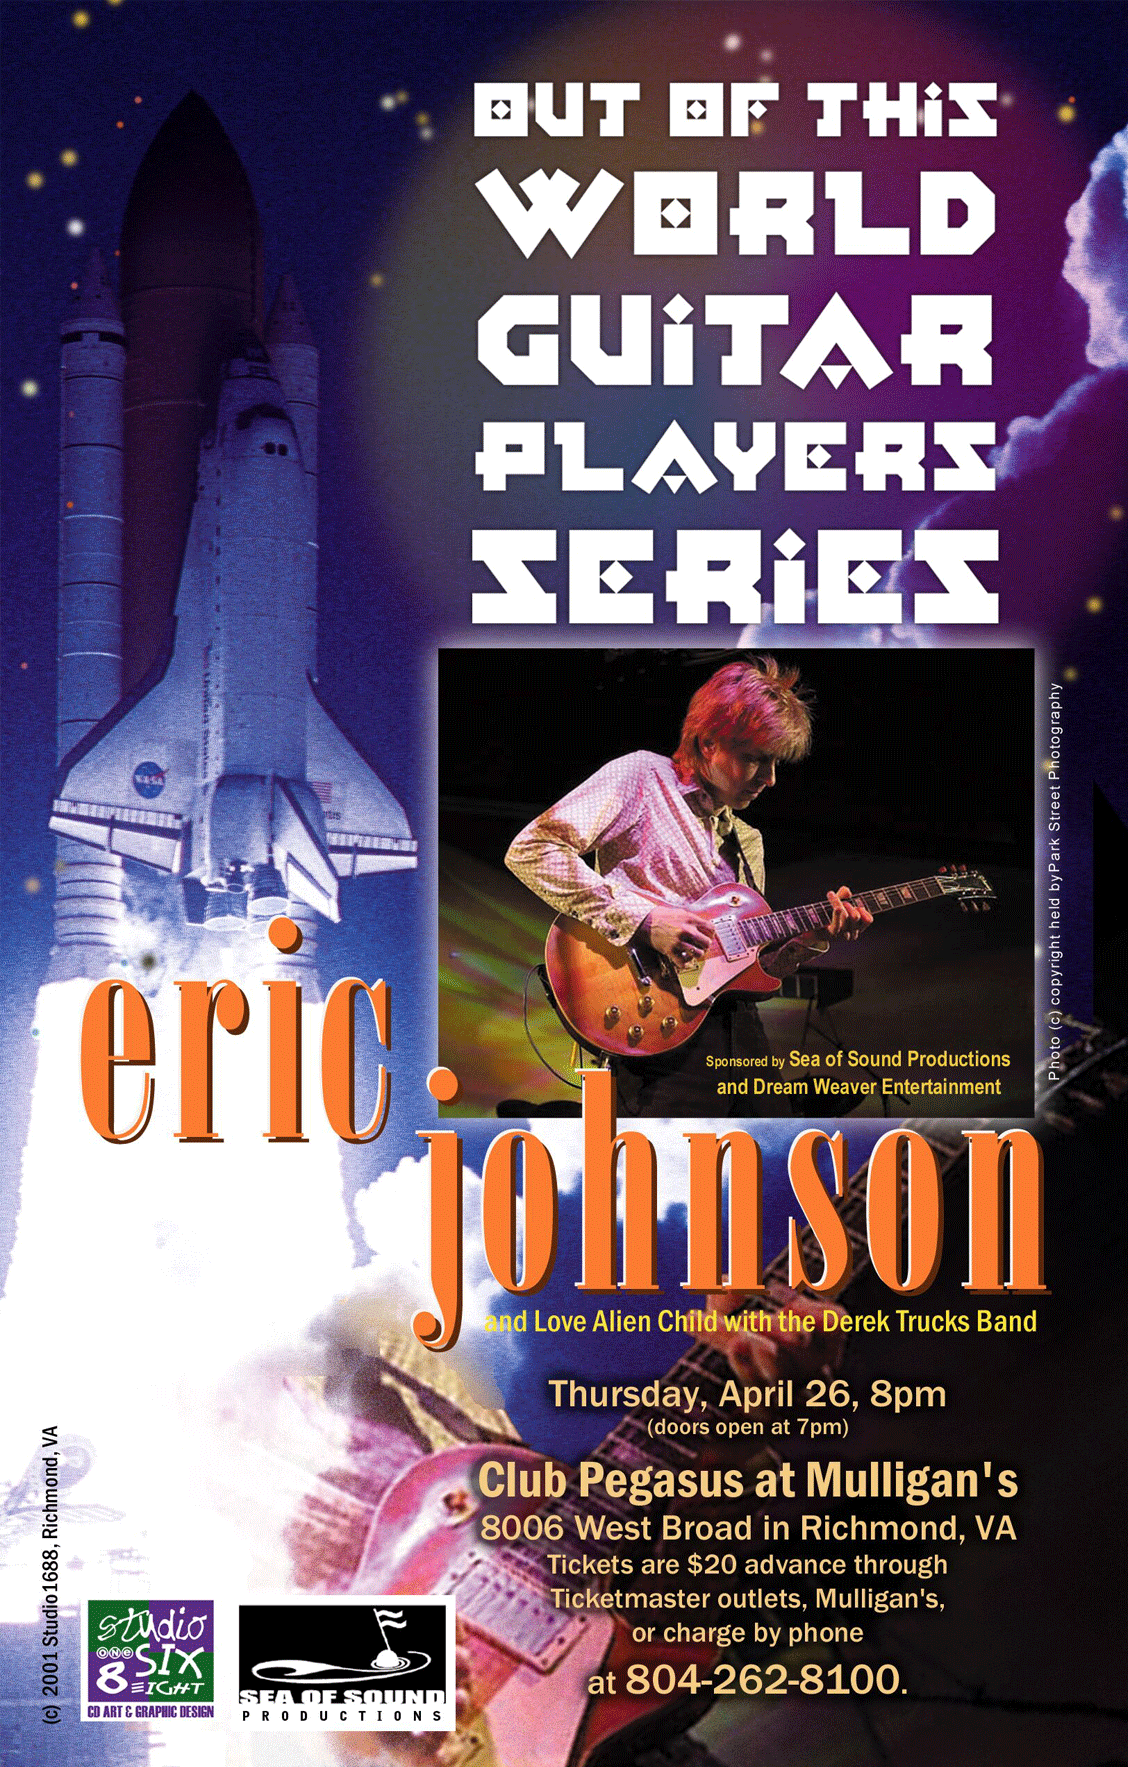 Eric-Johnson